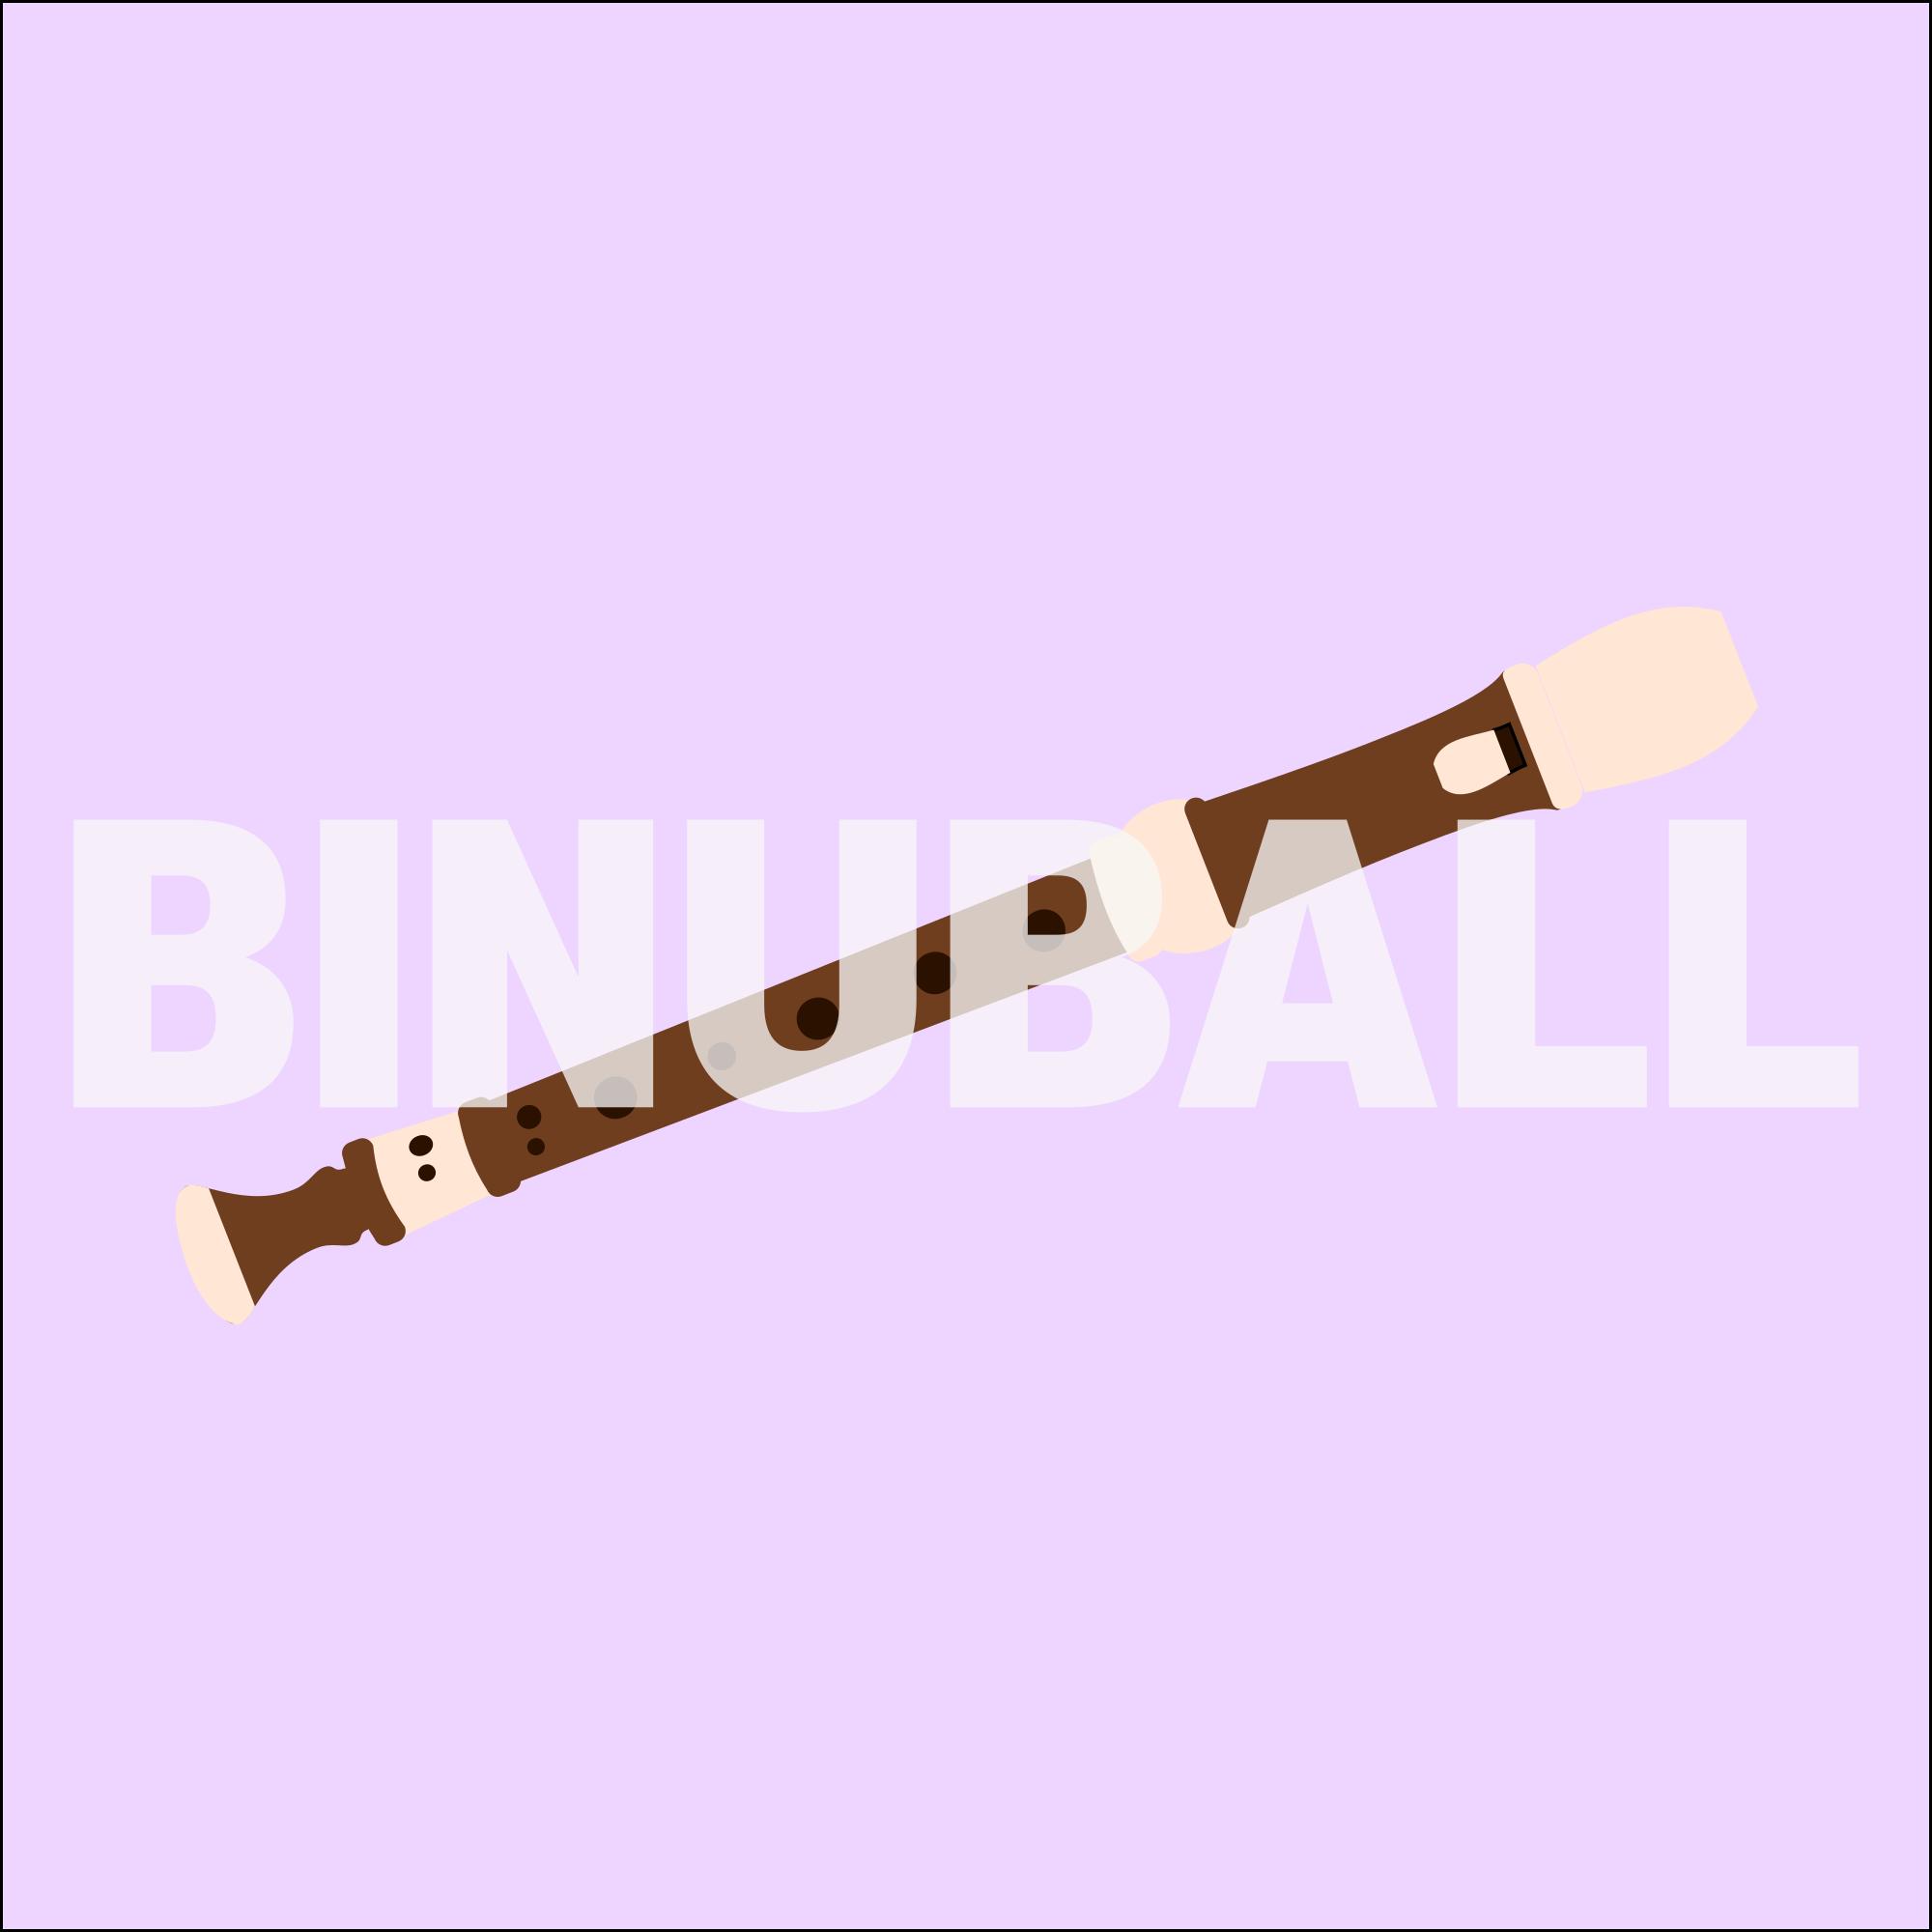 BINUBALL